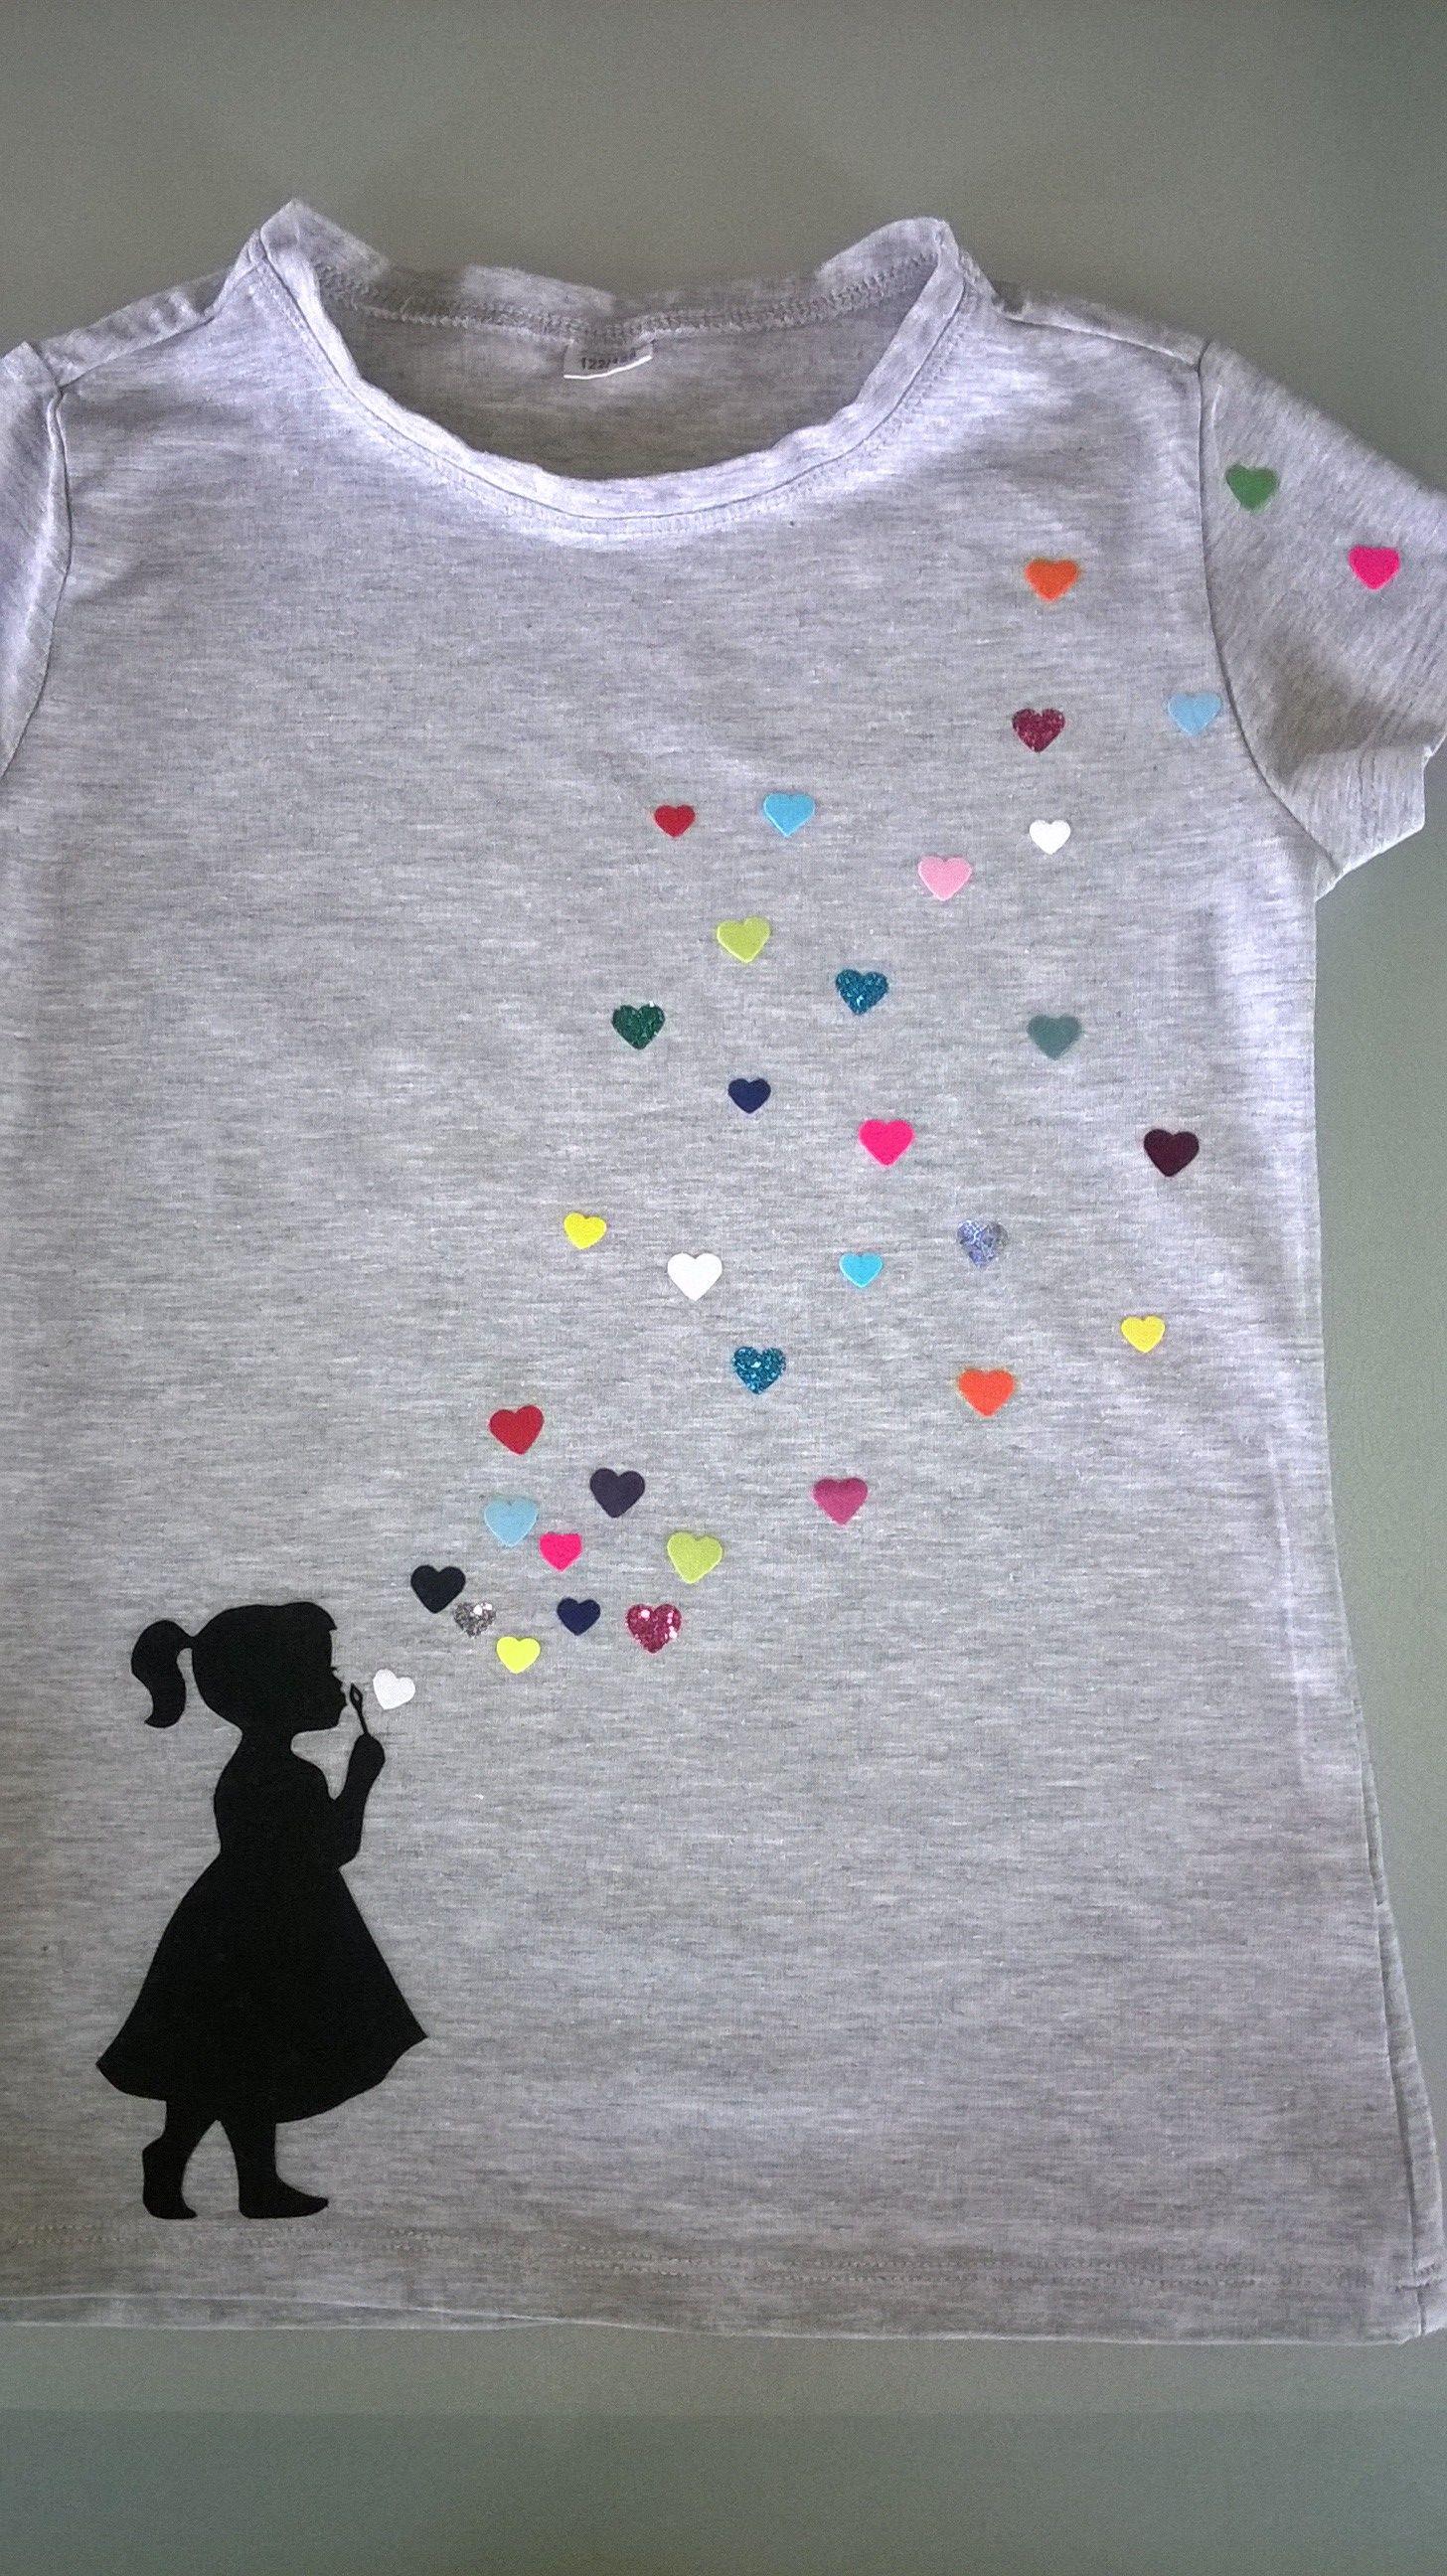 de9011fb0 Camisetas